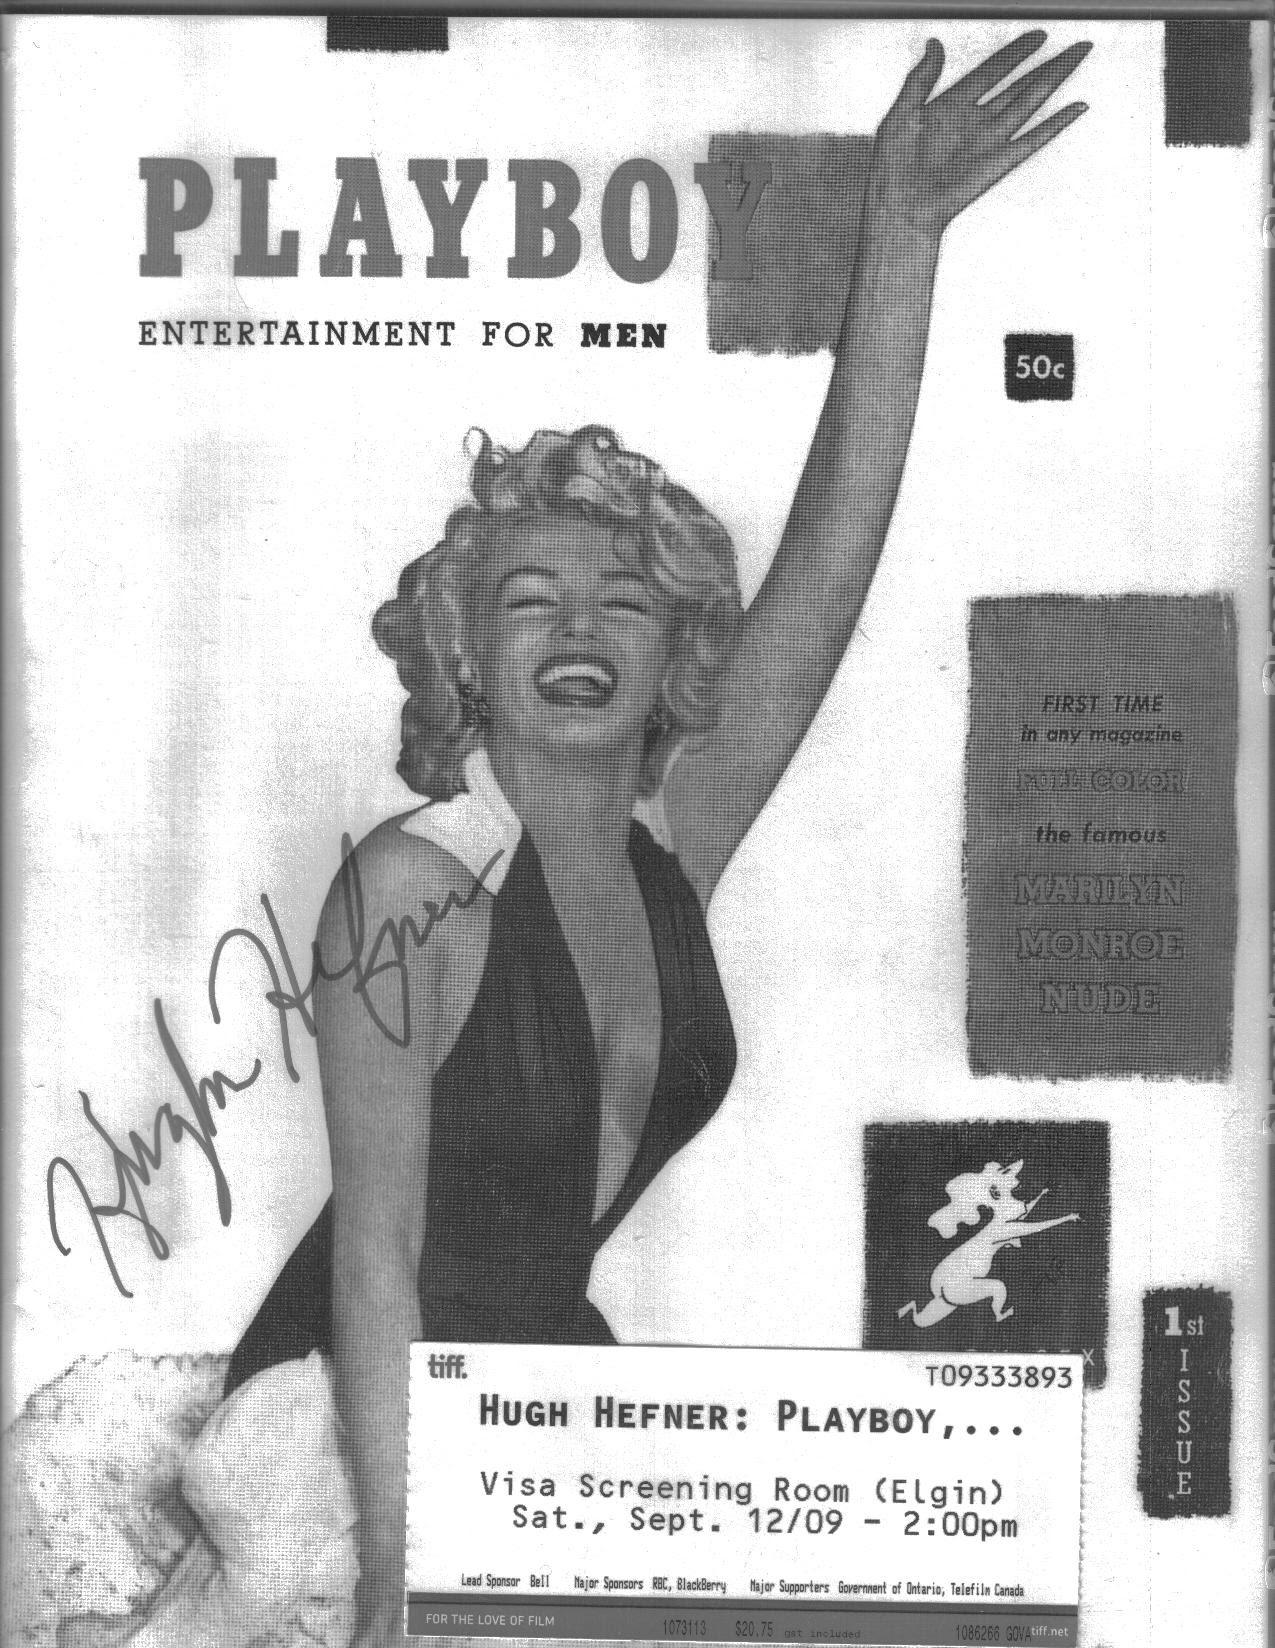 1st playboy